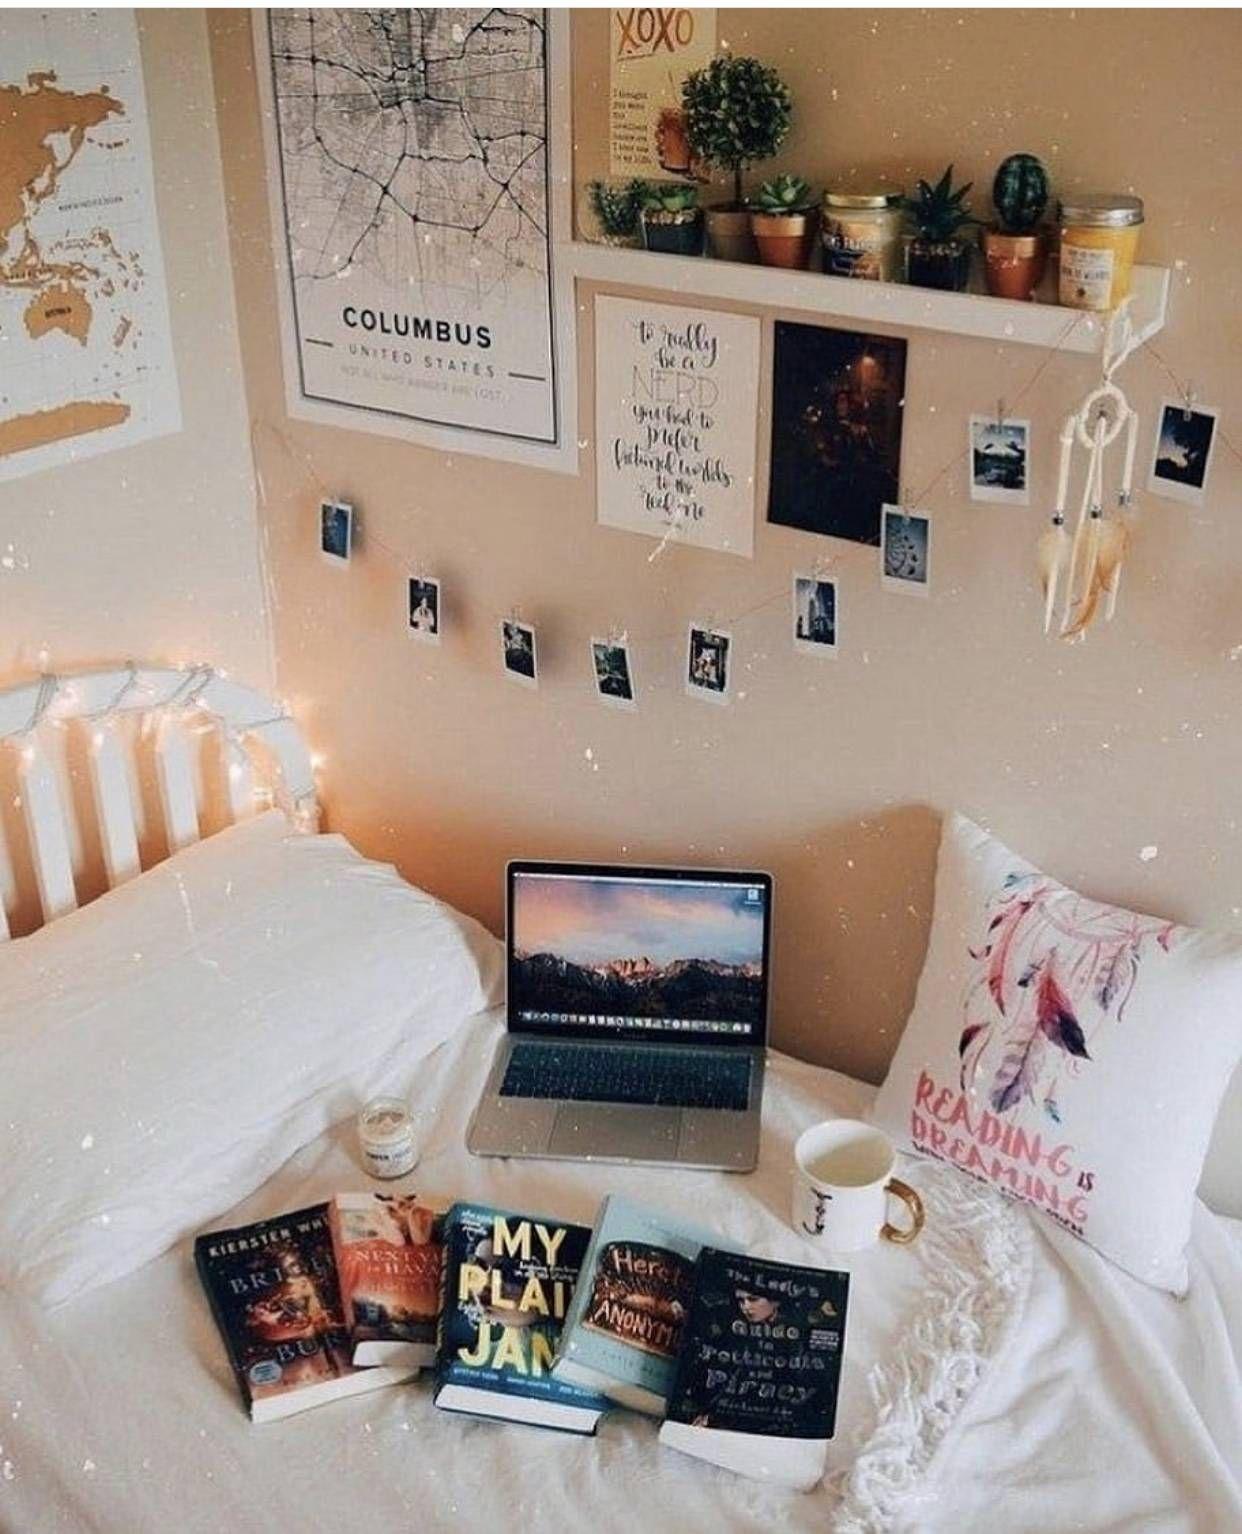 Vsco Decor Ideas Must Have Decor For A Vsco Room The Pink Dream Aesthetic Rooms Room Decor Bedroom Design